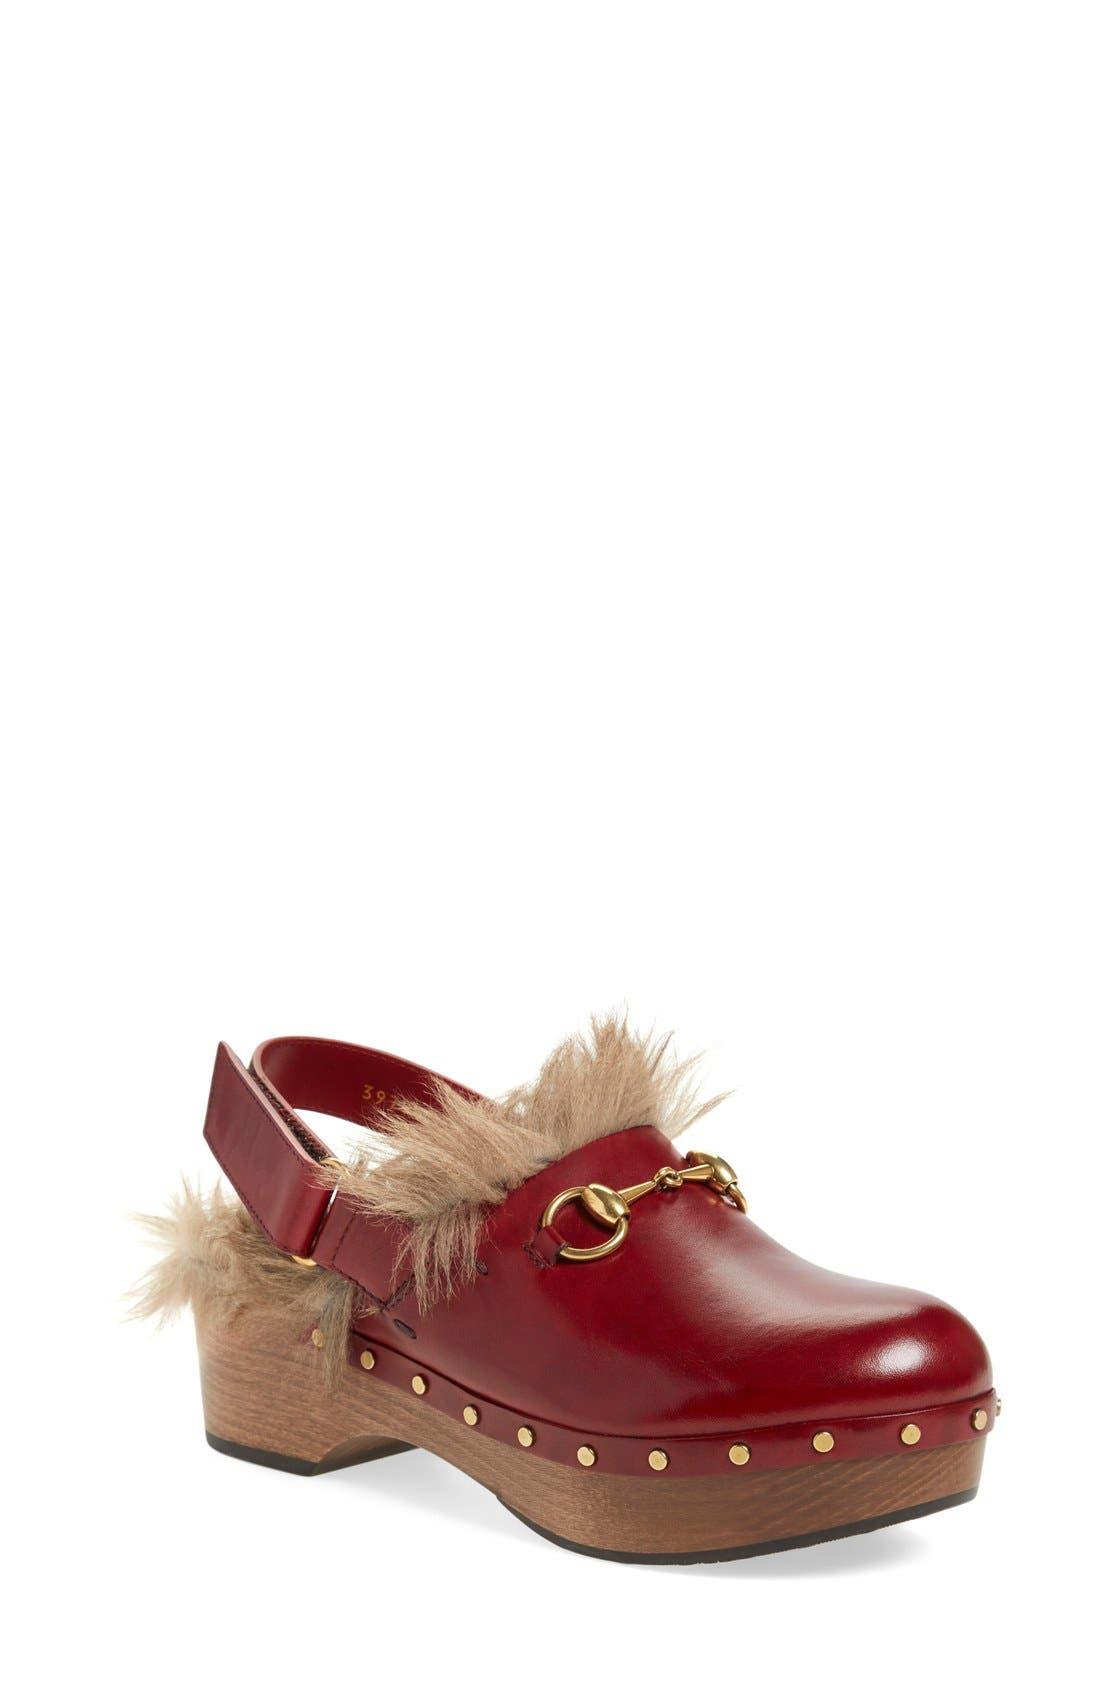 'Amstel' Genuine Kangaroo Fur Clog,                         Main,                         color, Burgundy/ Red